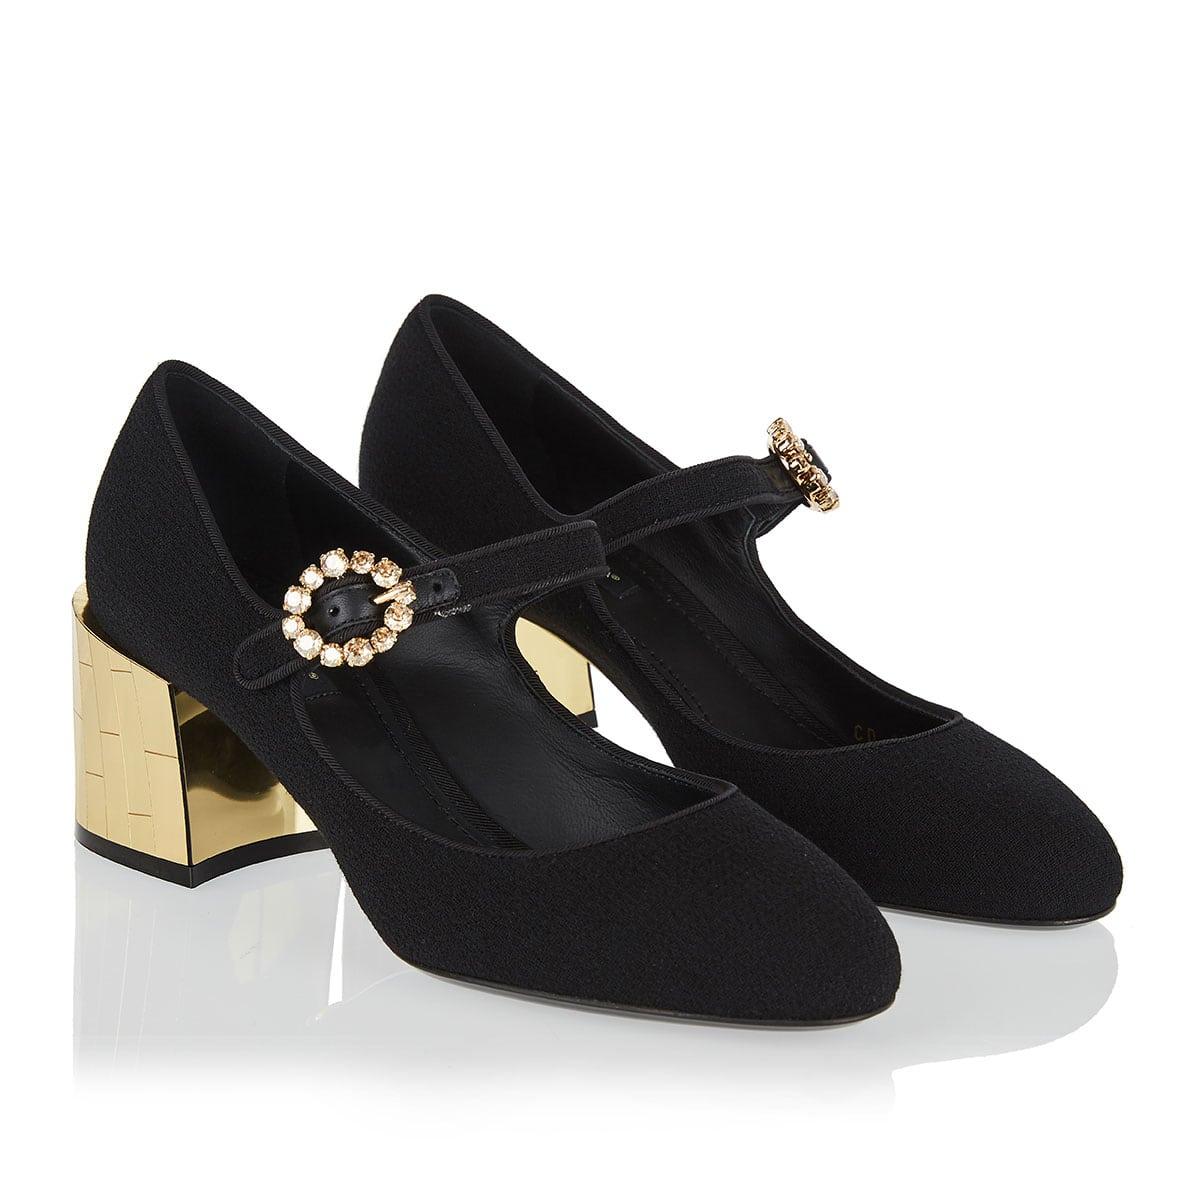 Embellished Mary-Jane pumps